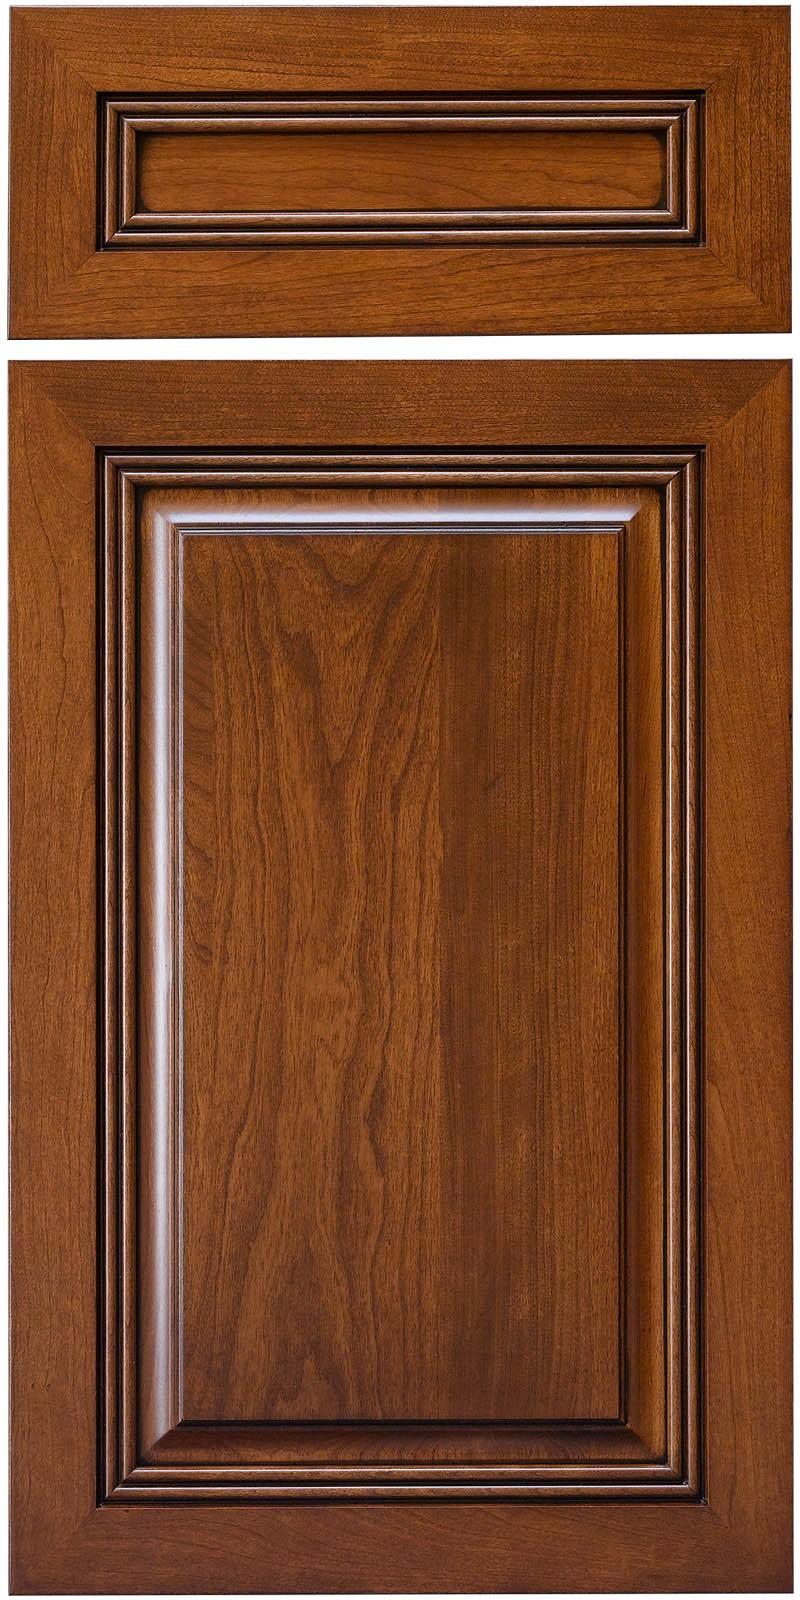 Crp10533 Solid Wood Materials Cabinet Doors Amp Drawer